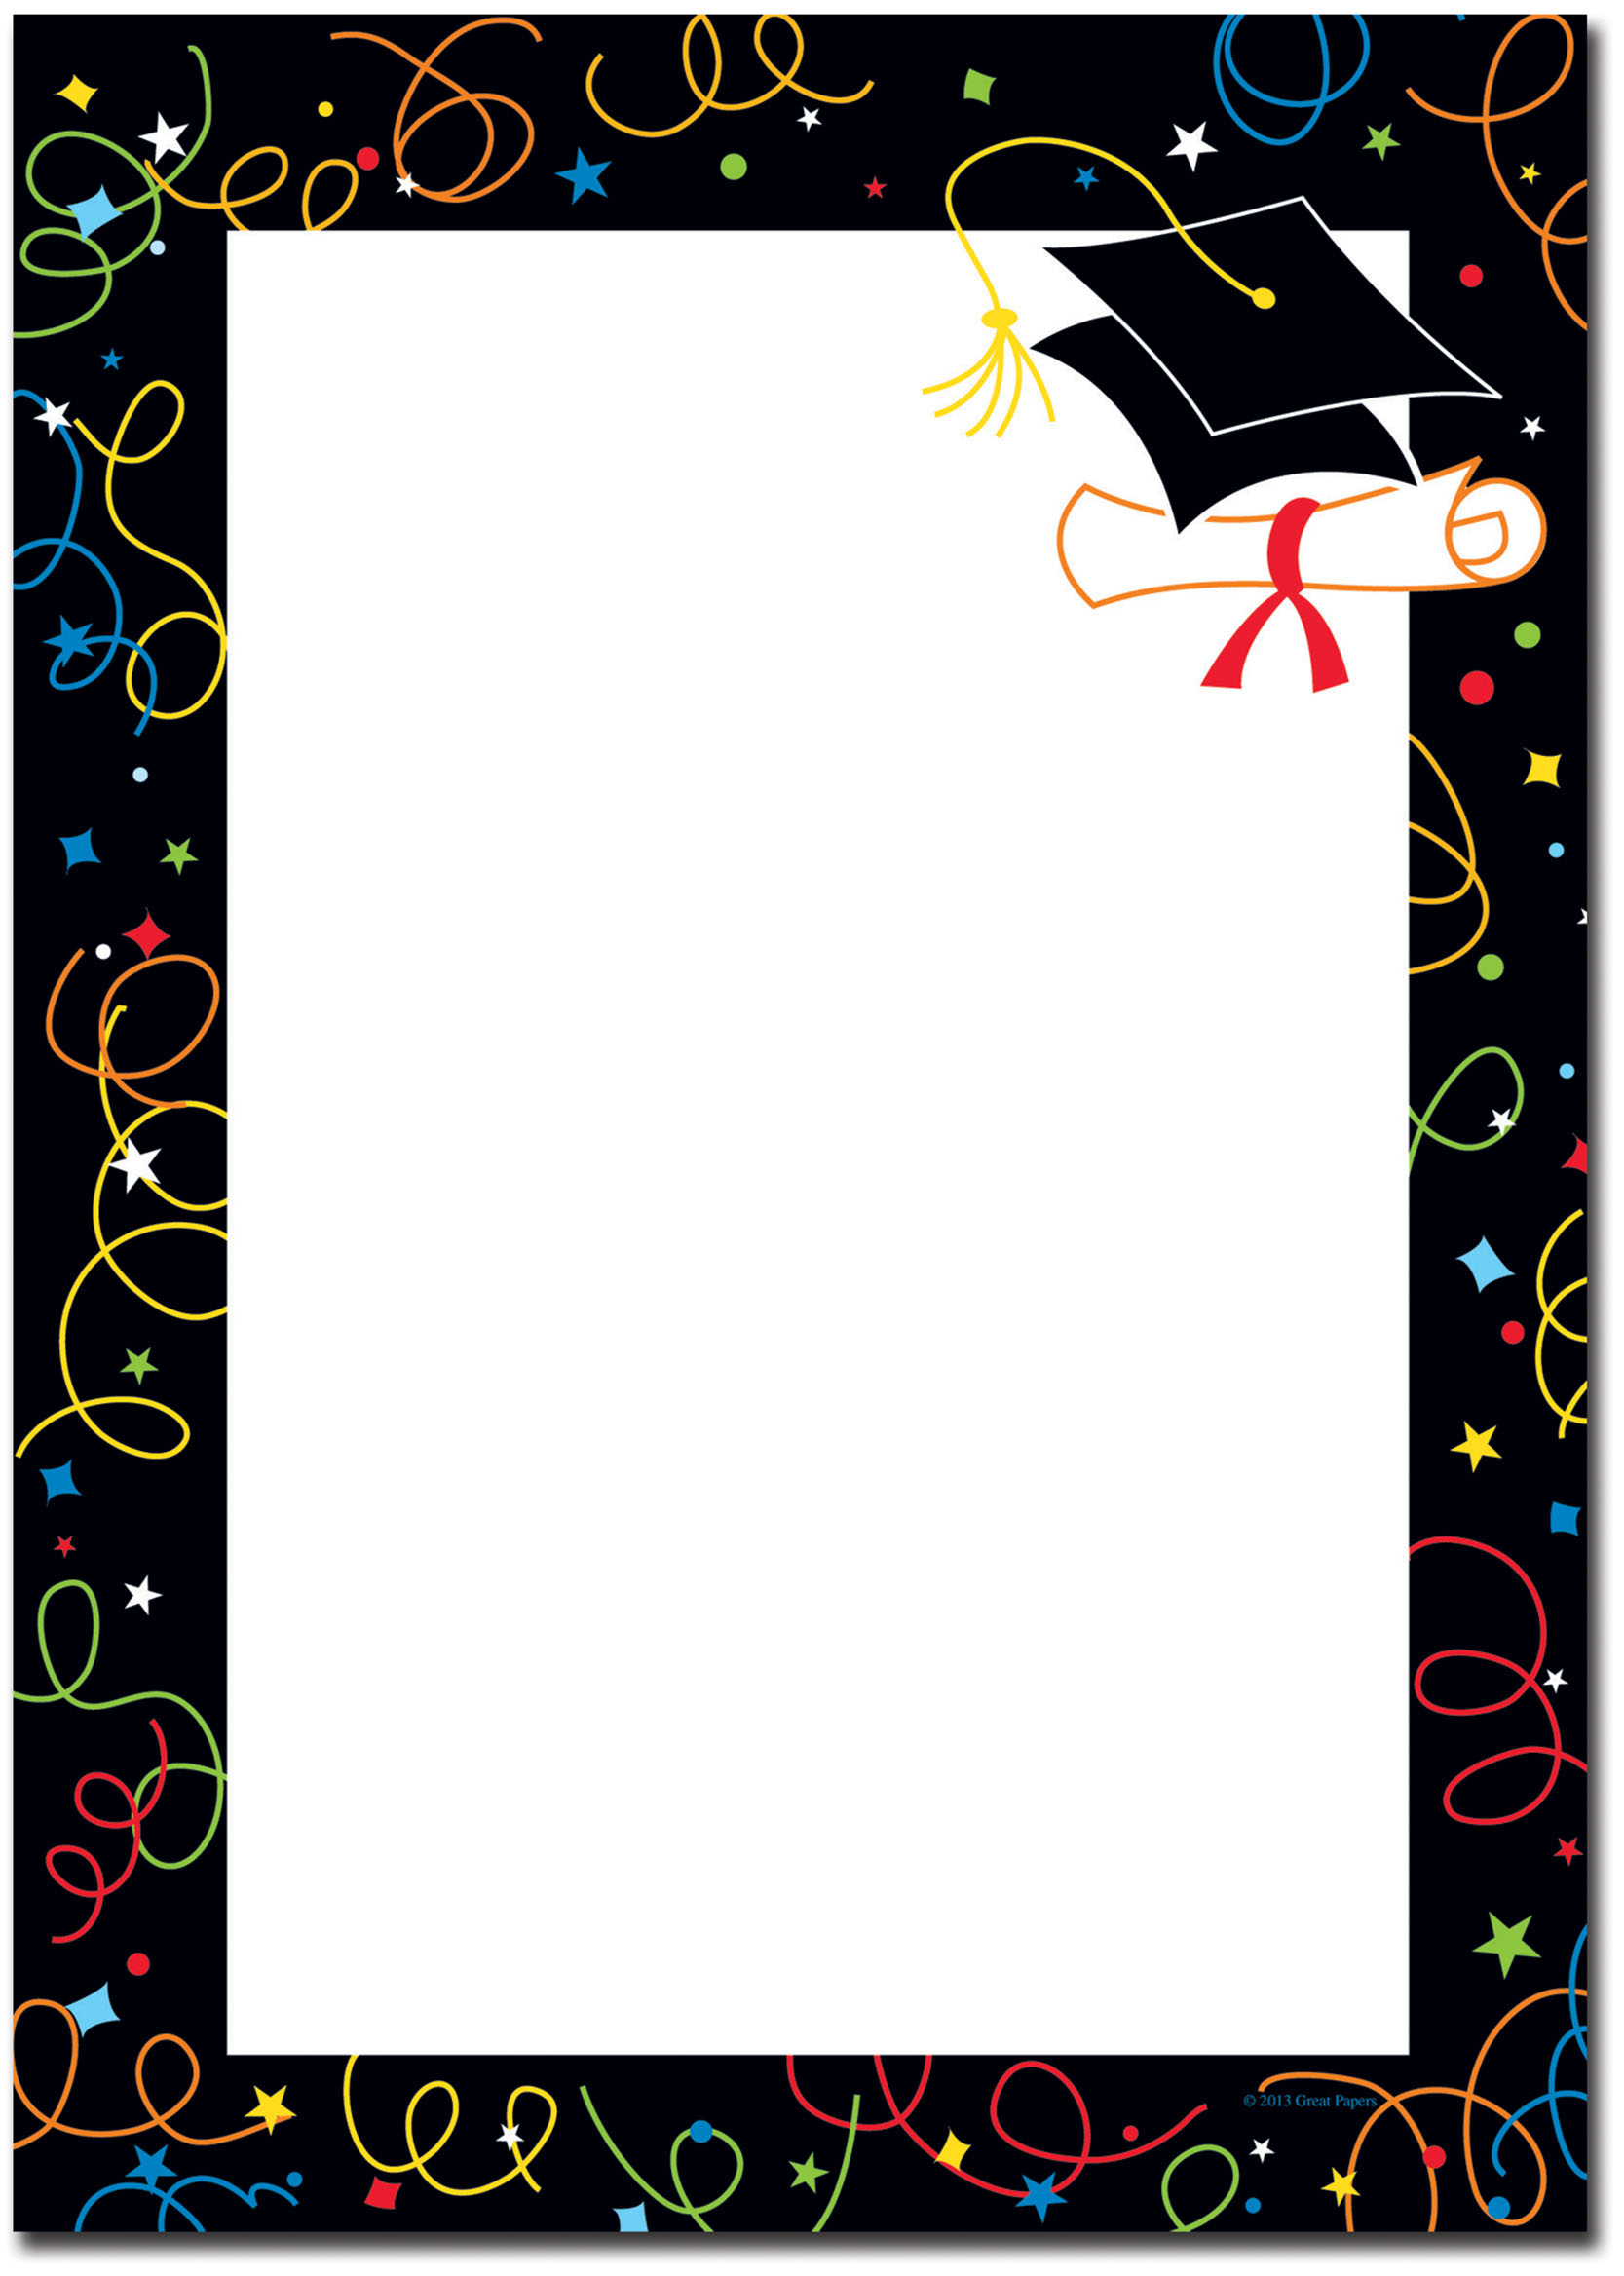 Graduation Border Templates Free Printable Paper - 7.19.hus - Free Printable Graduation Paper